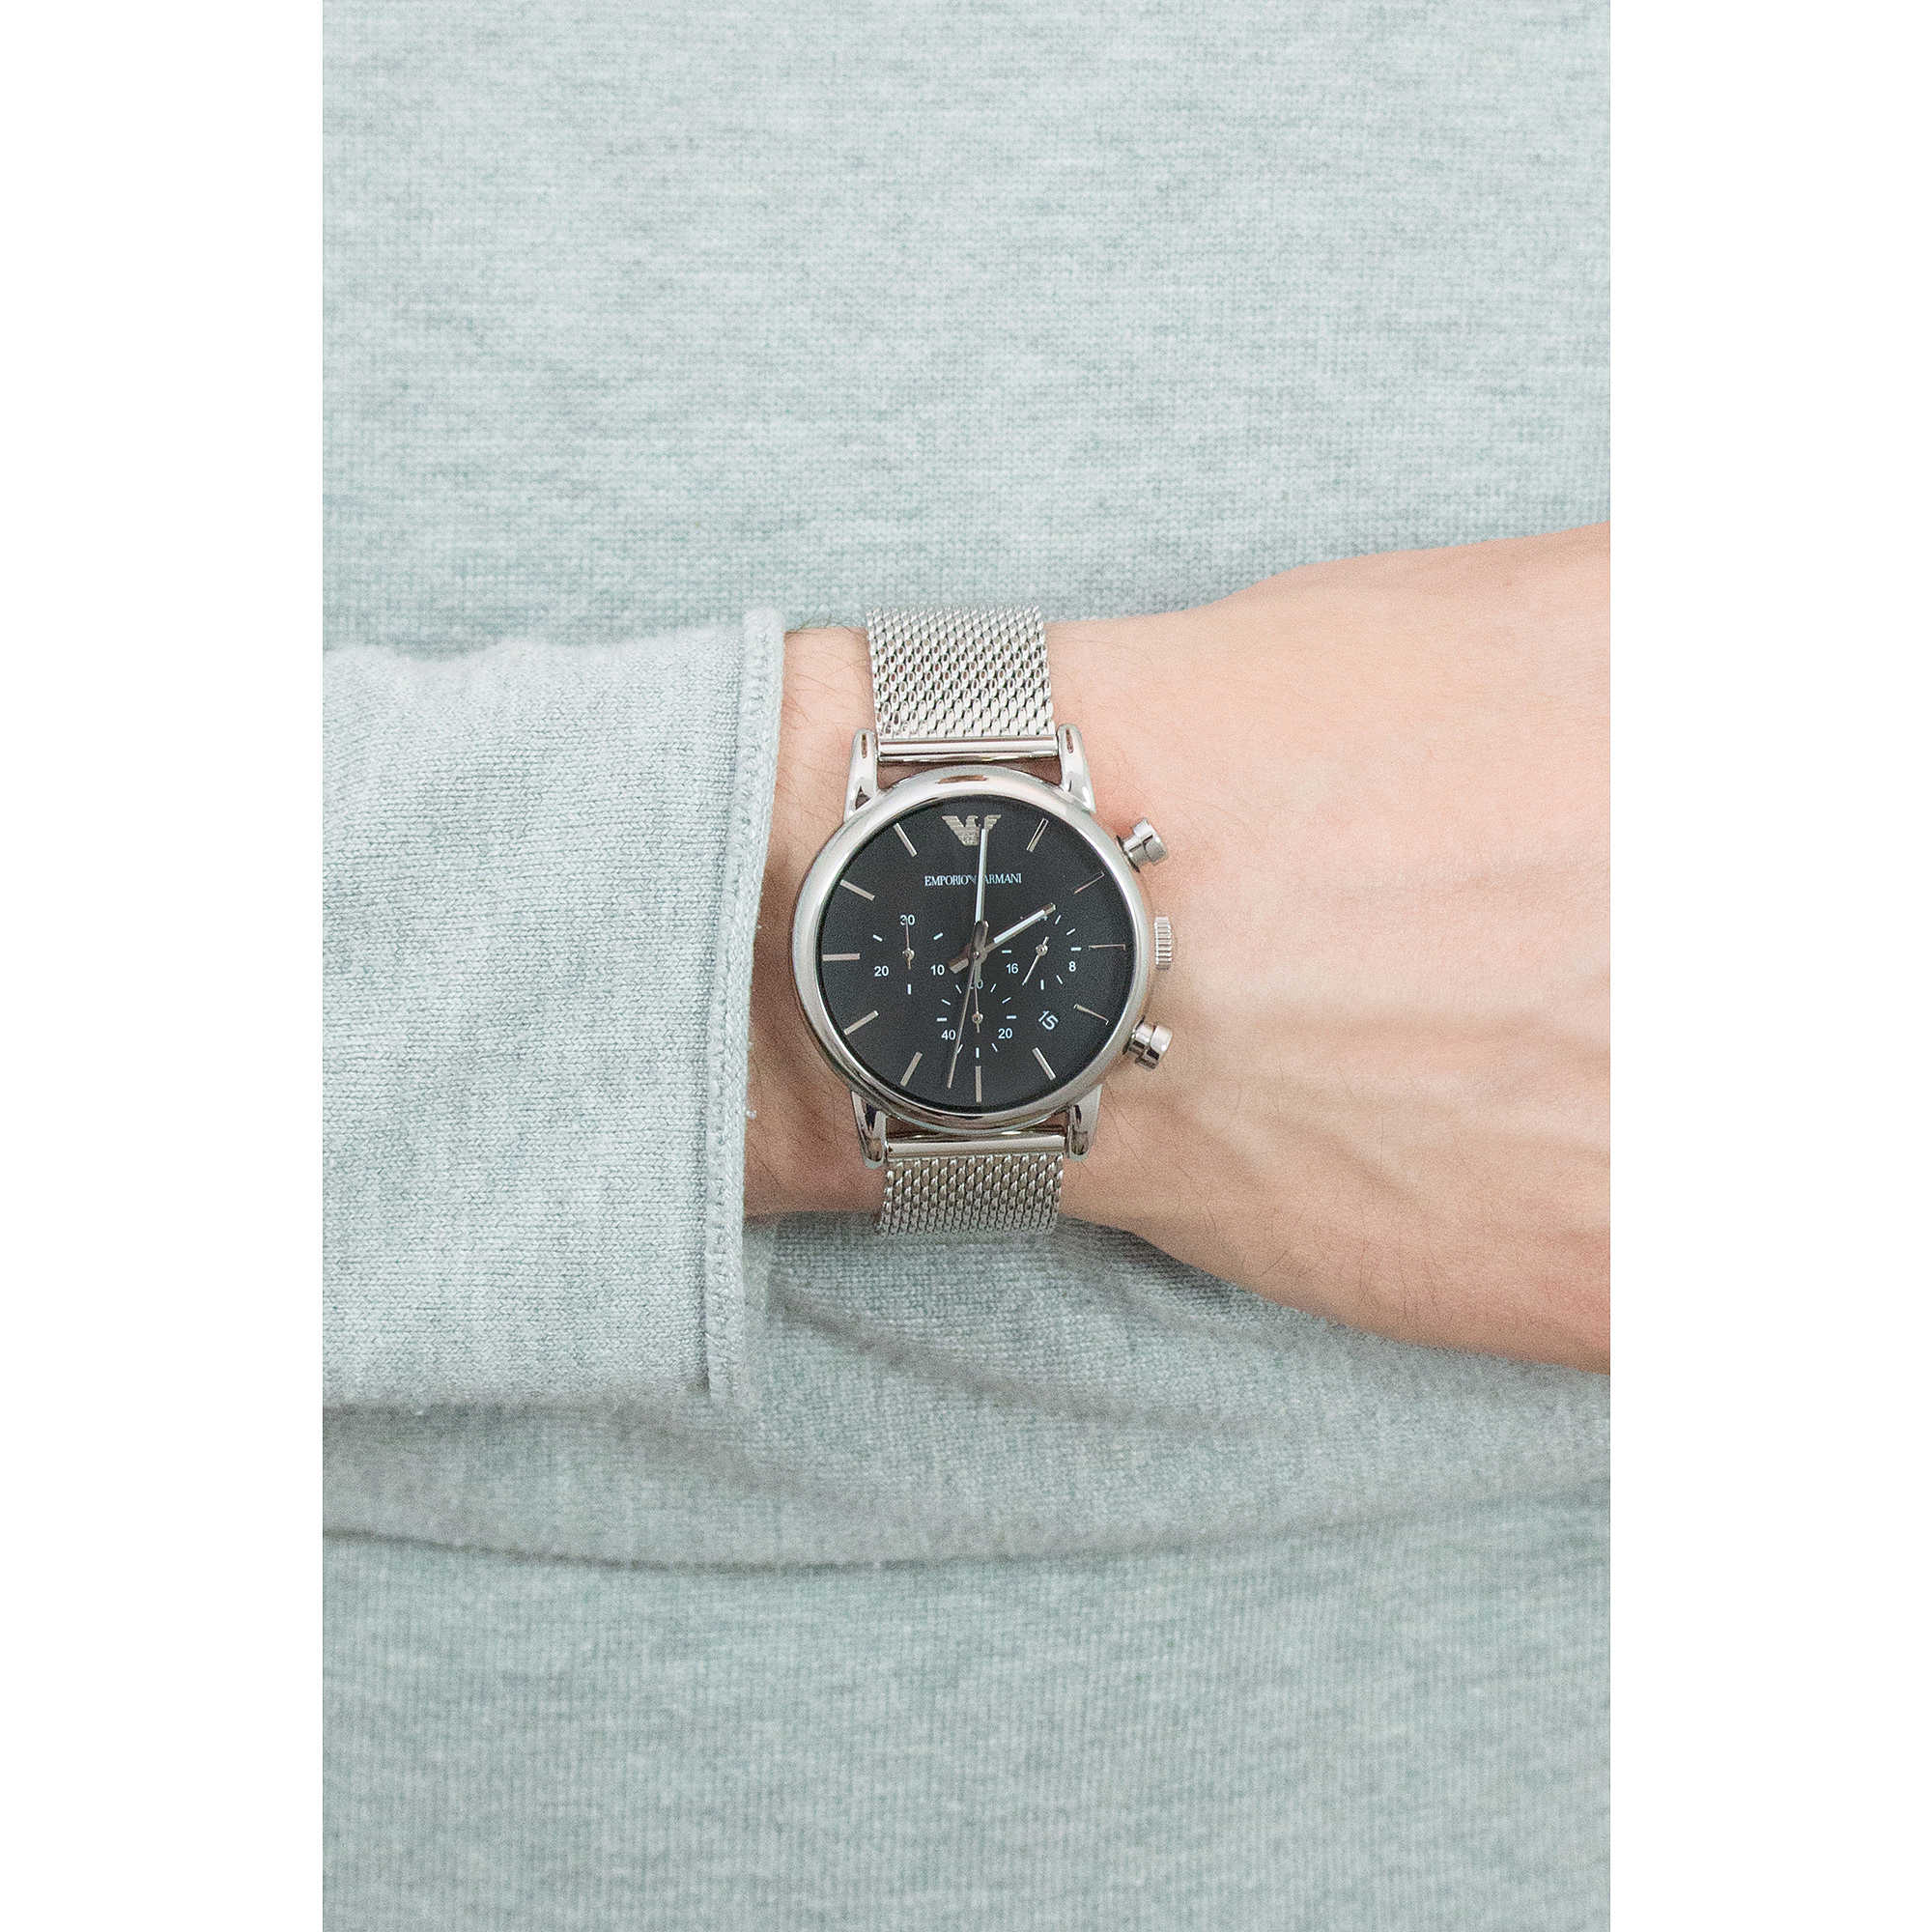 d6dcd045cff watch chronograph man Emporio Armani AR1811 chronographs Emporio Armani